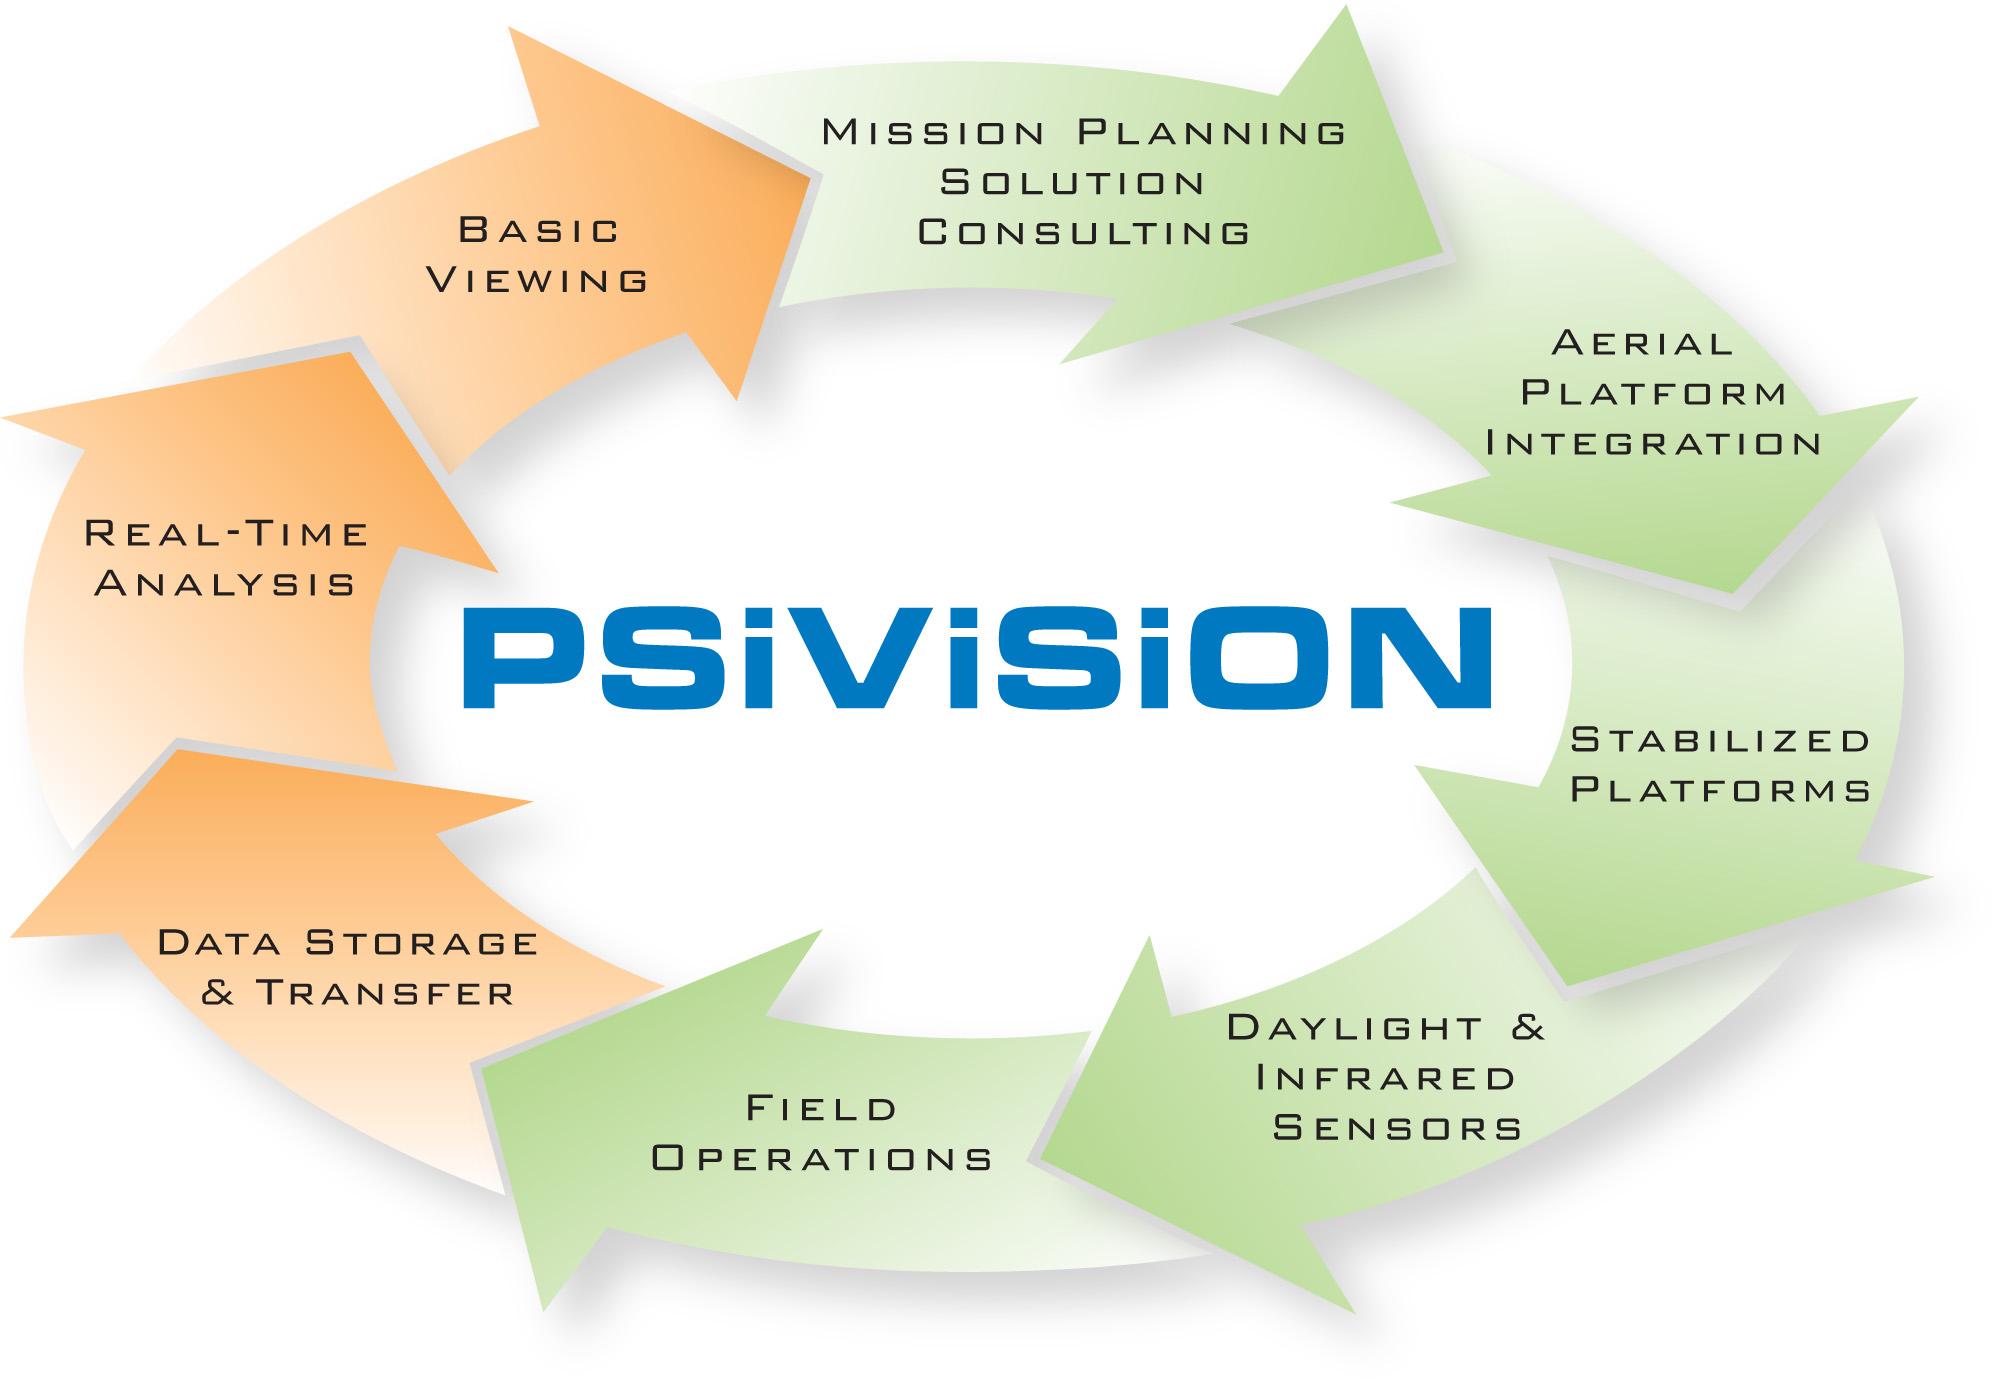 PSI Vision